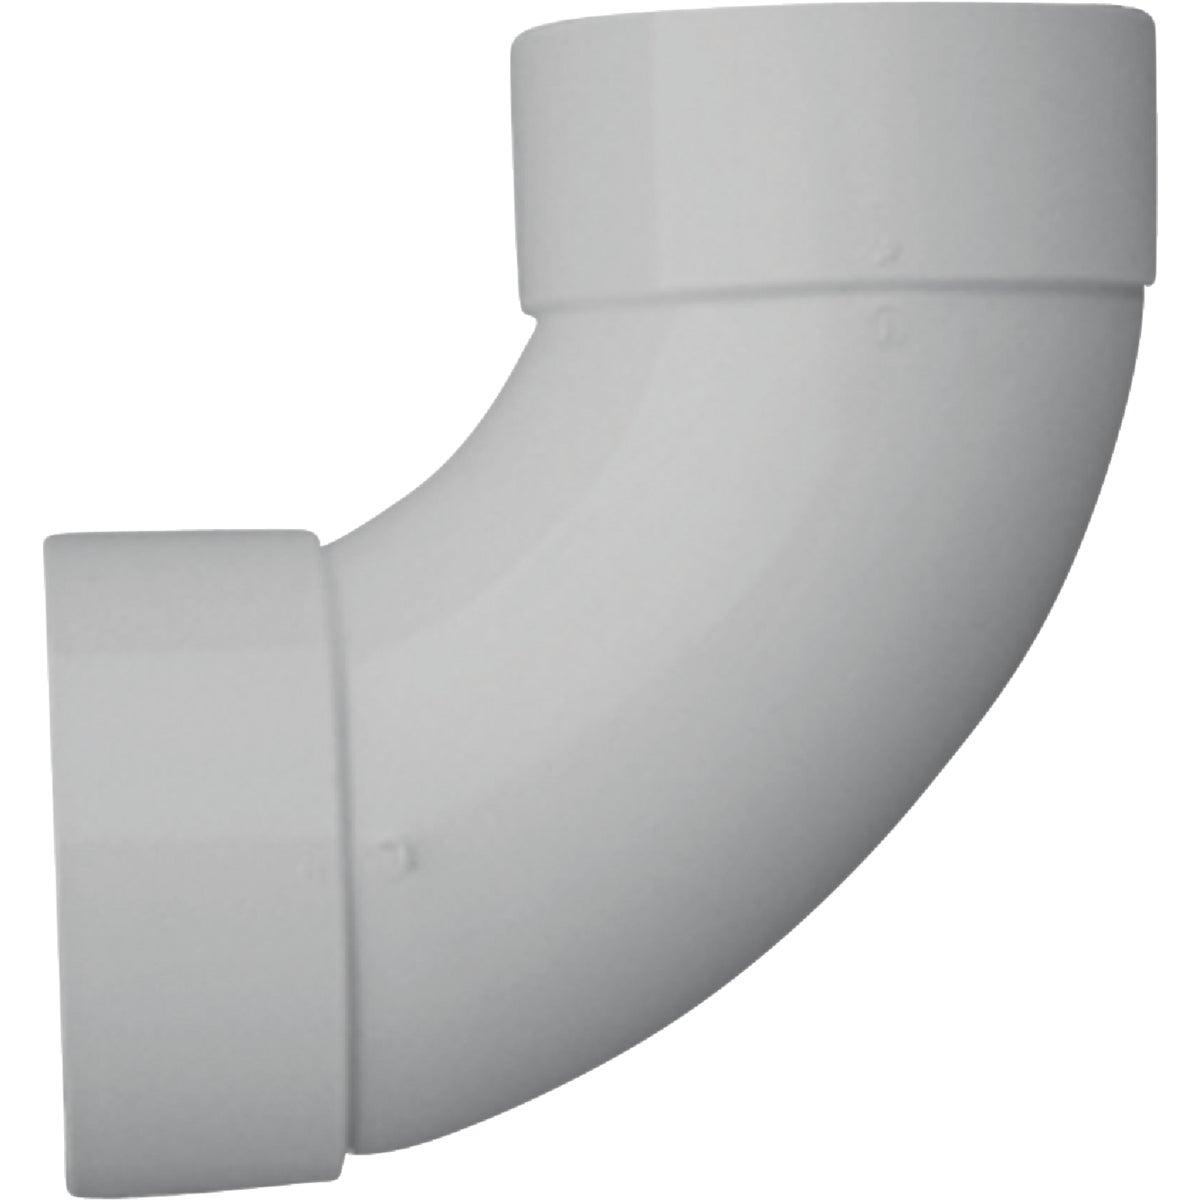 "6"" 90D S&D PVC SAN ELBOW"